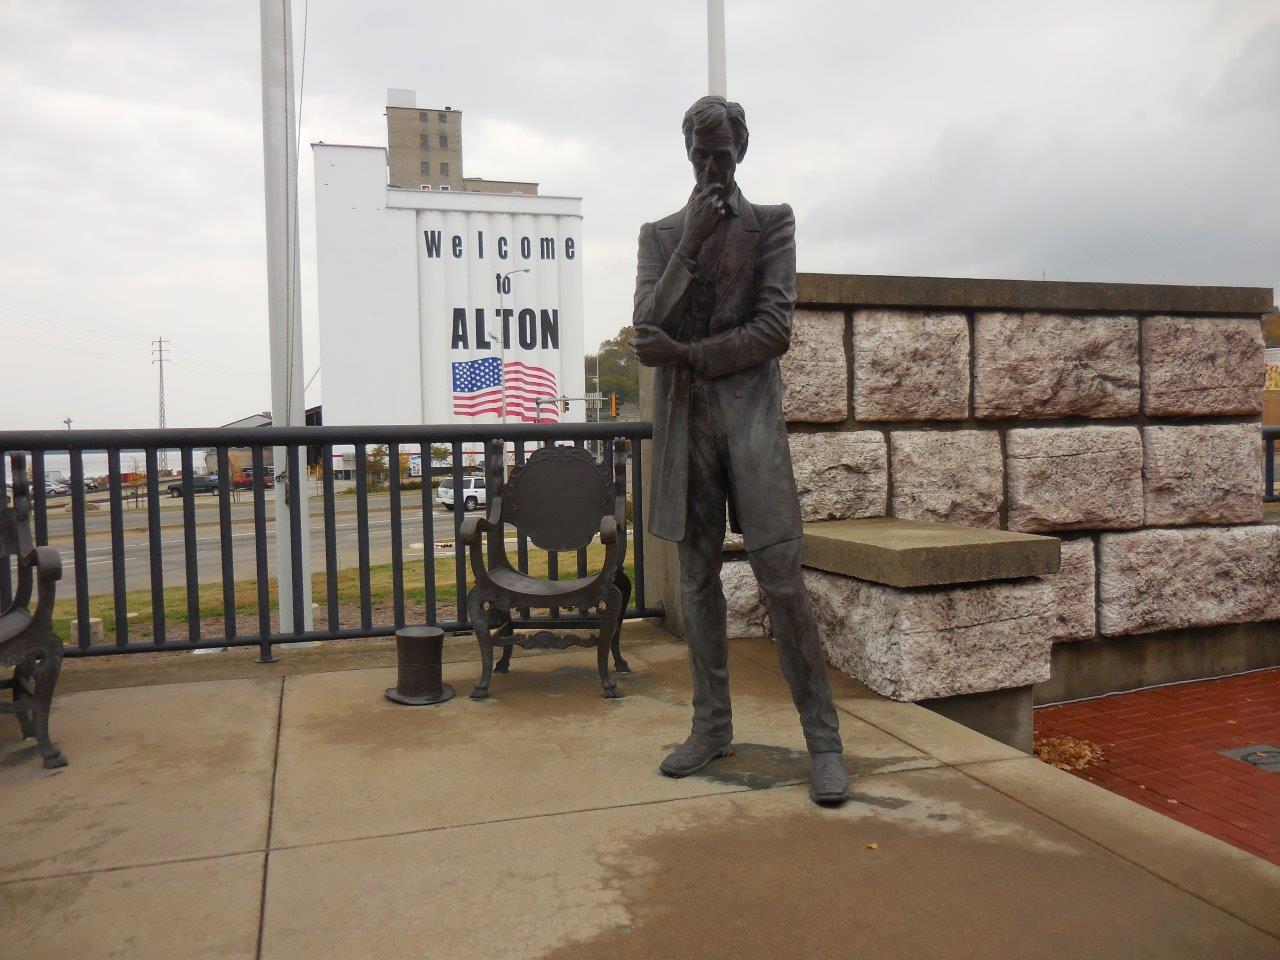 Lincoln-Douglas debate monument